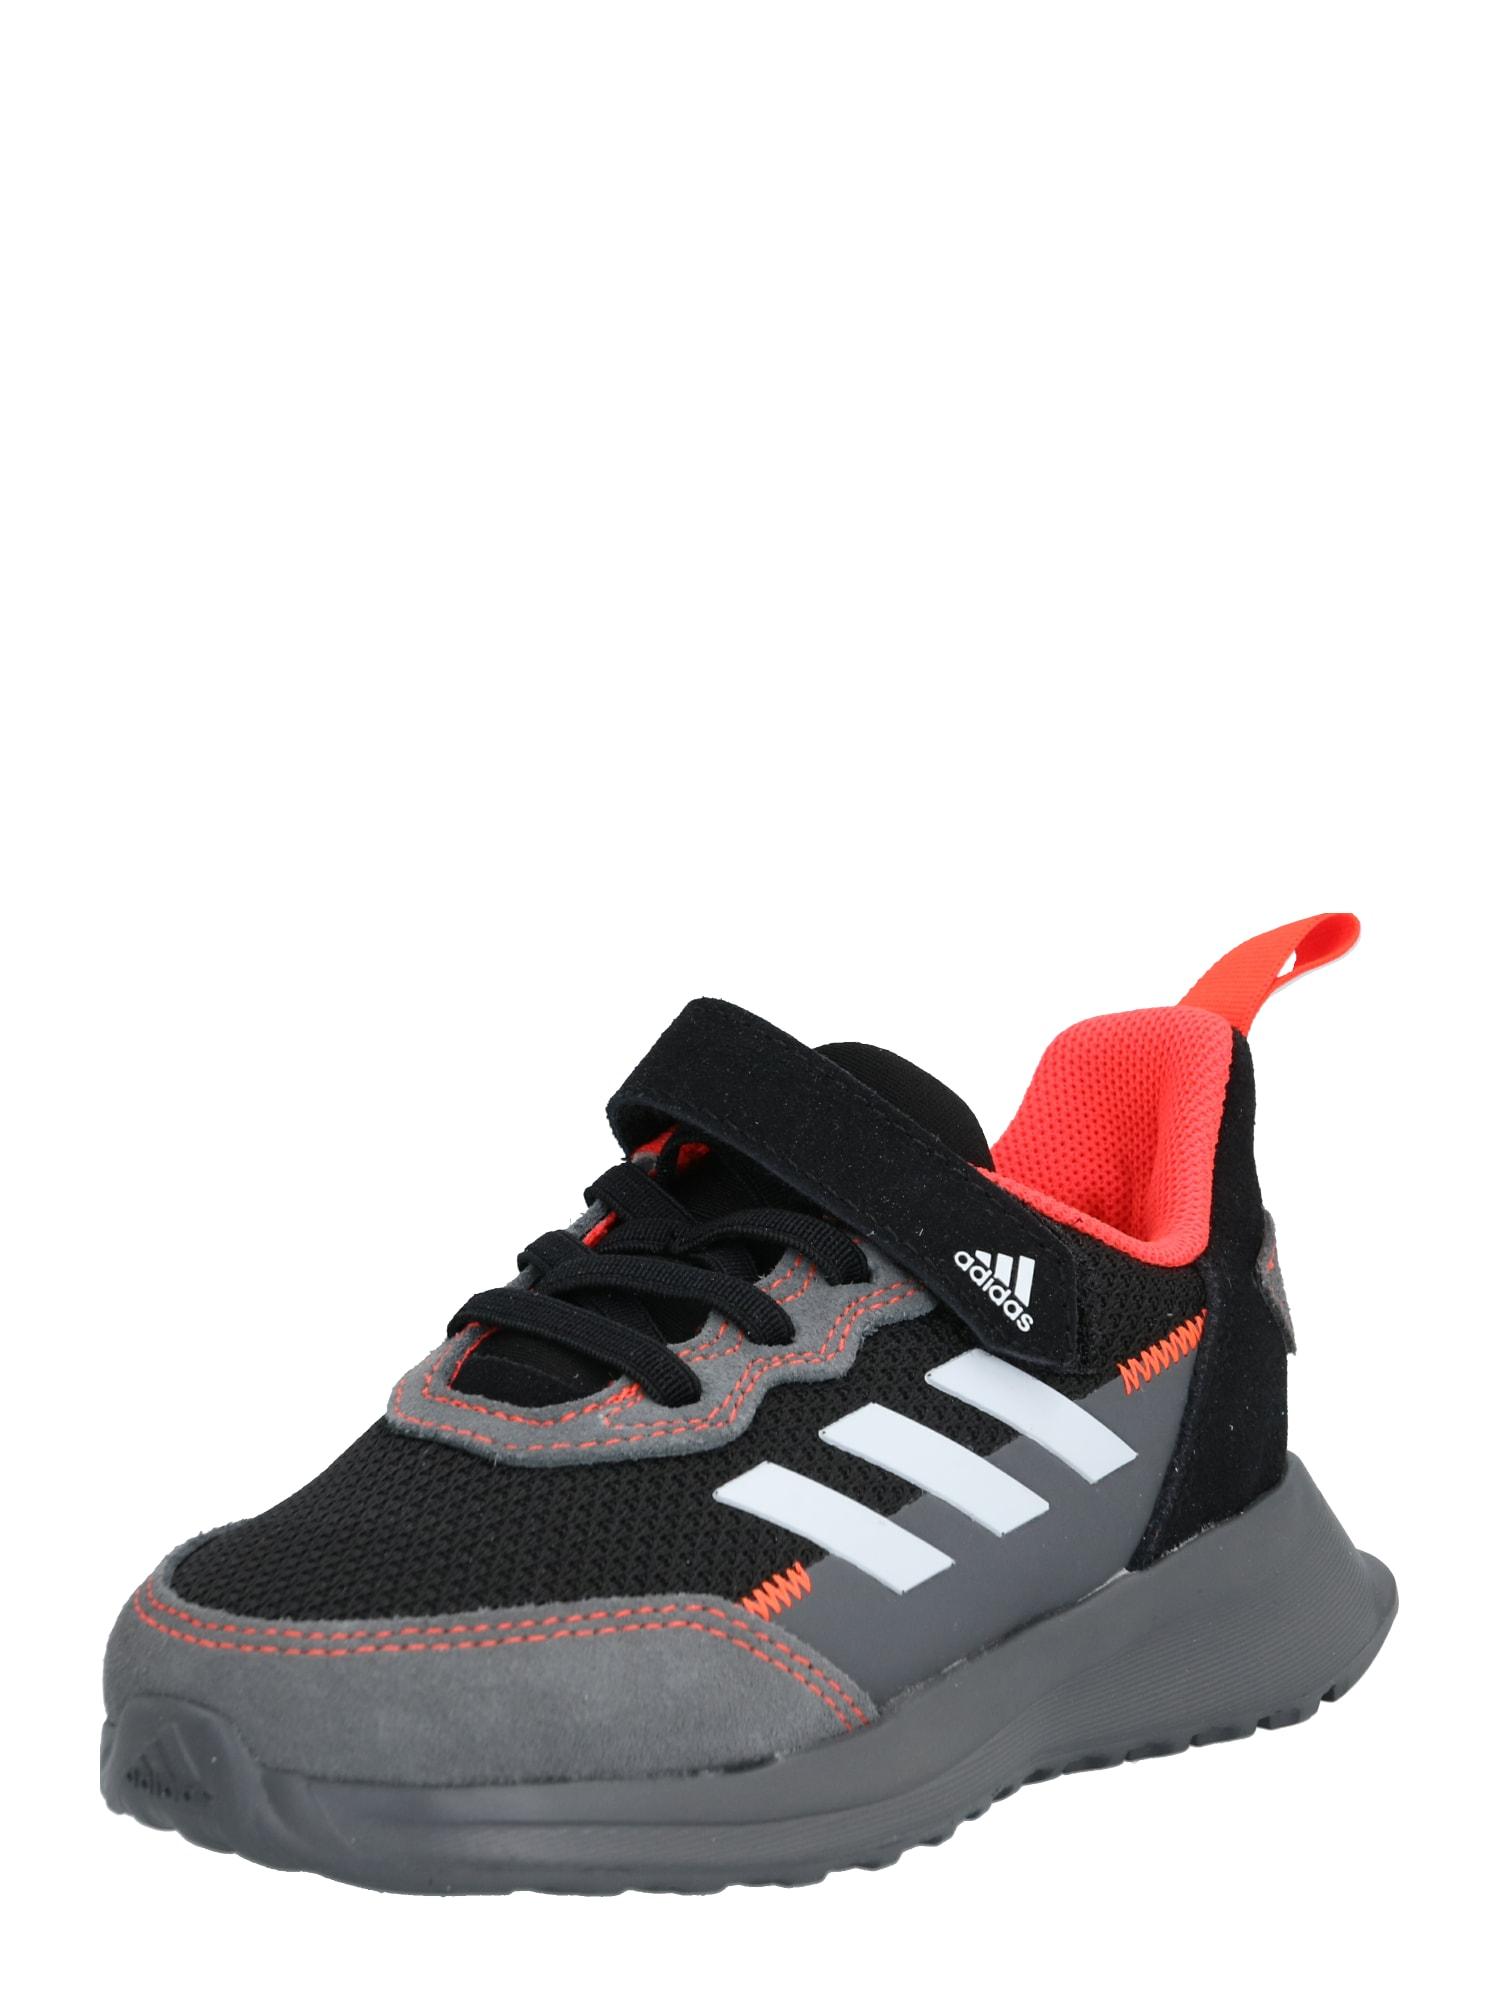 ADIDAS PERFORMANCE Športová obuv  oranžová / čierna / sivá